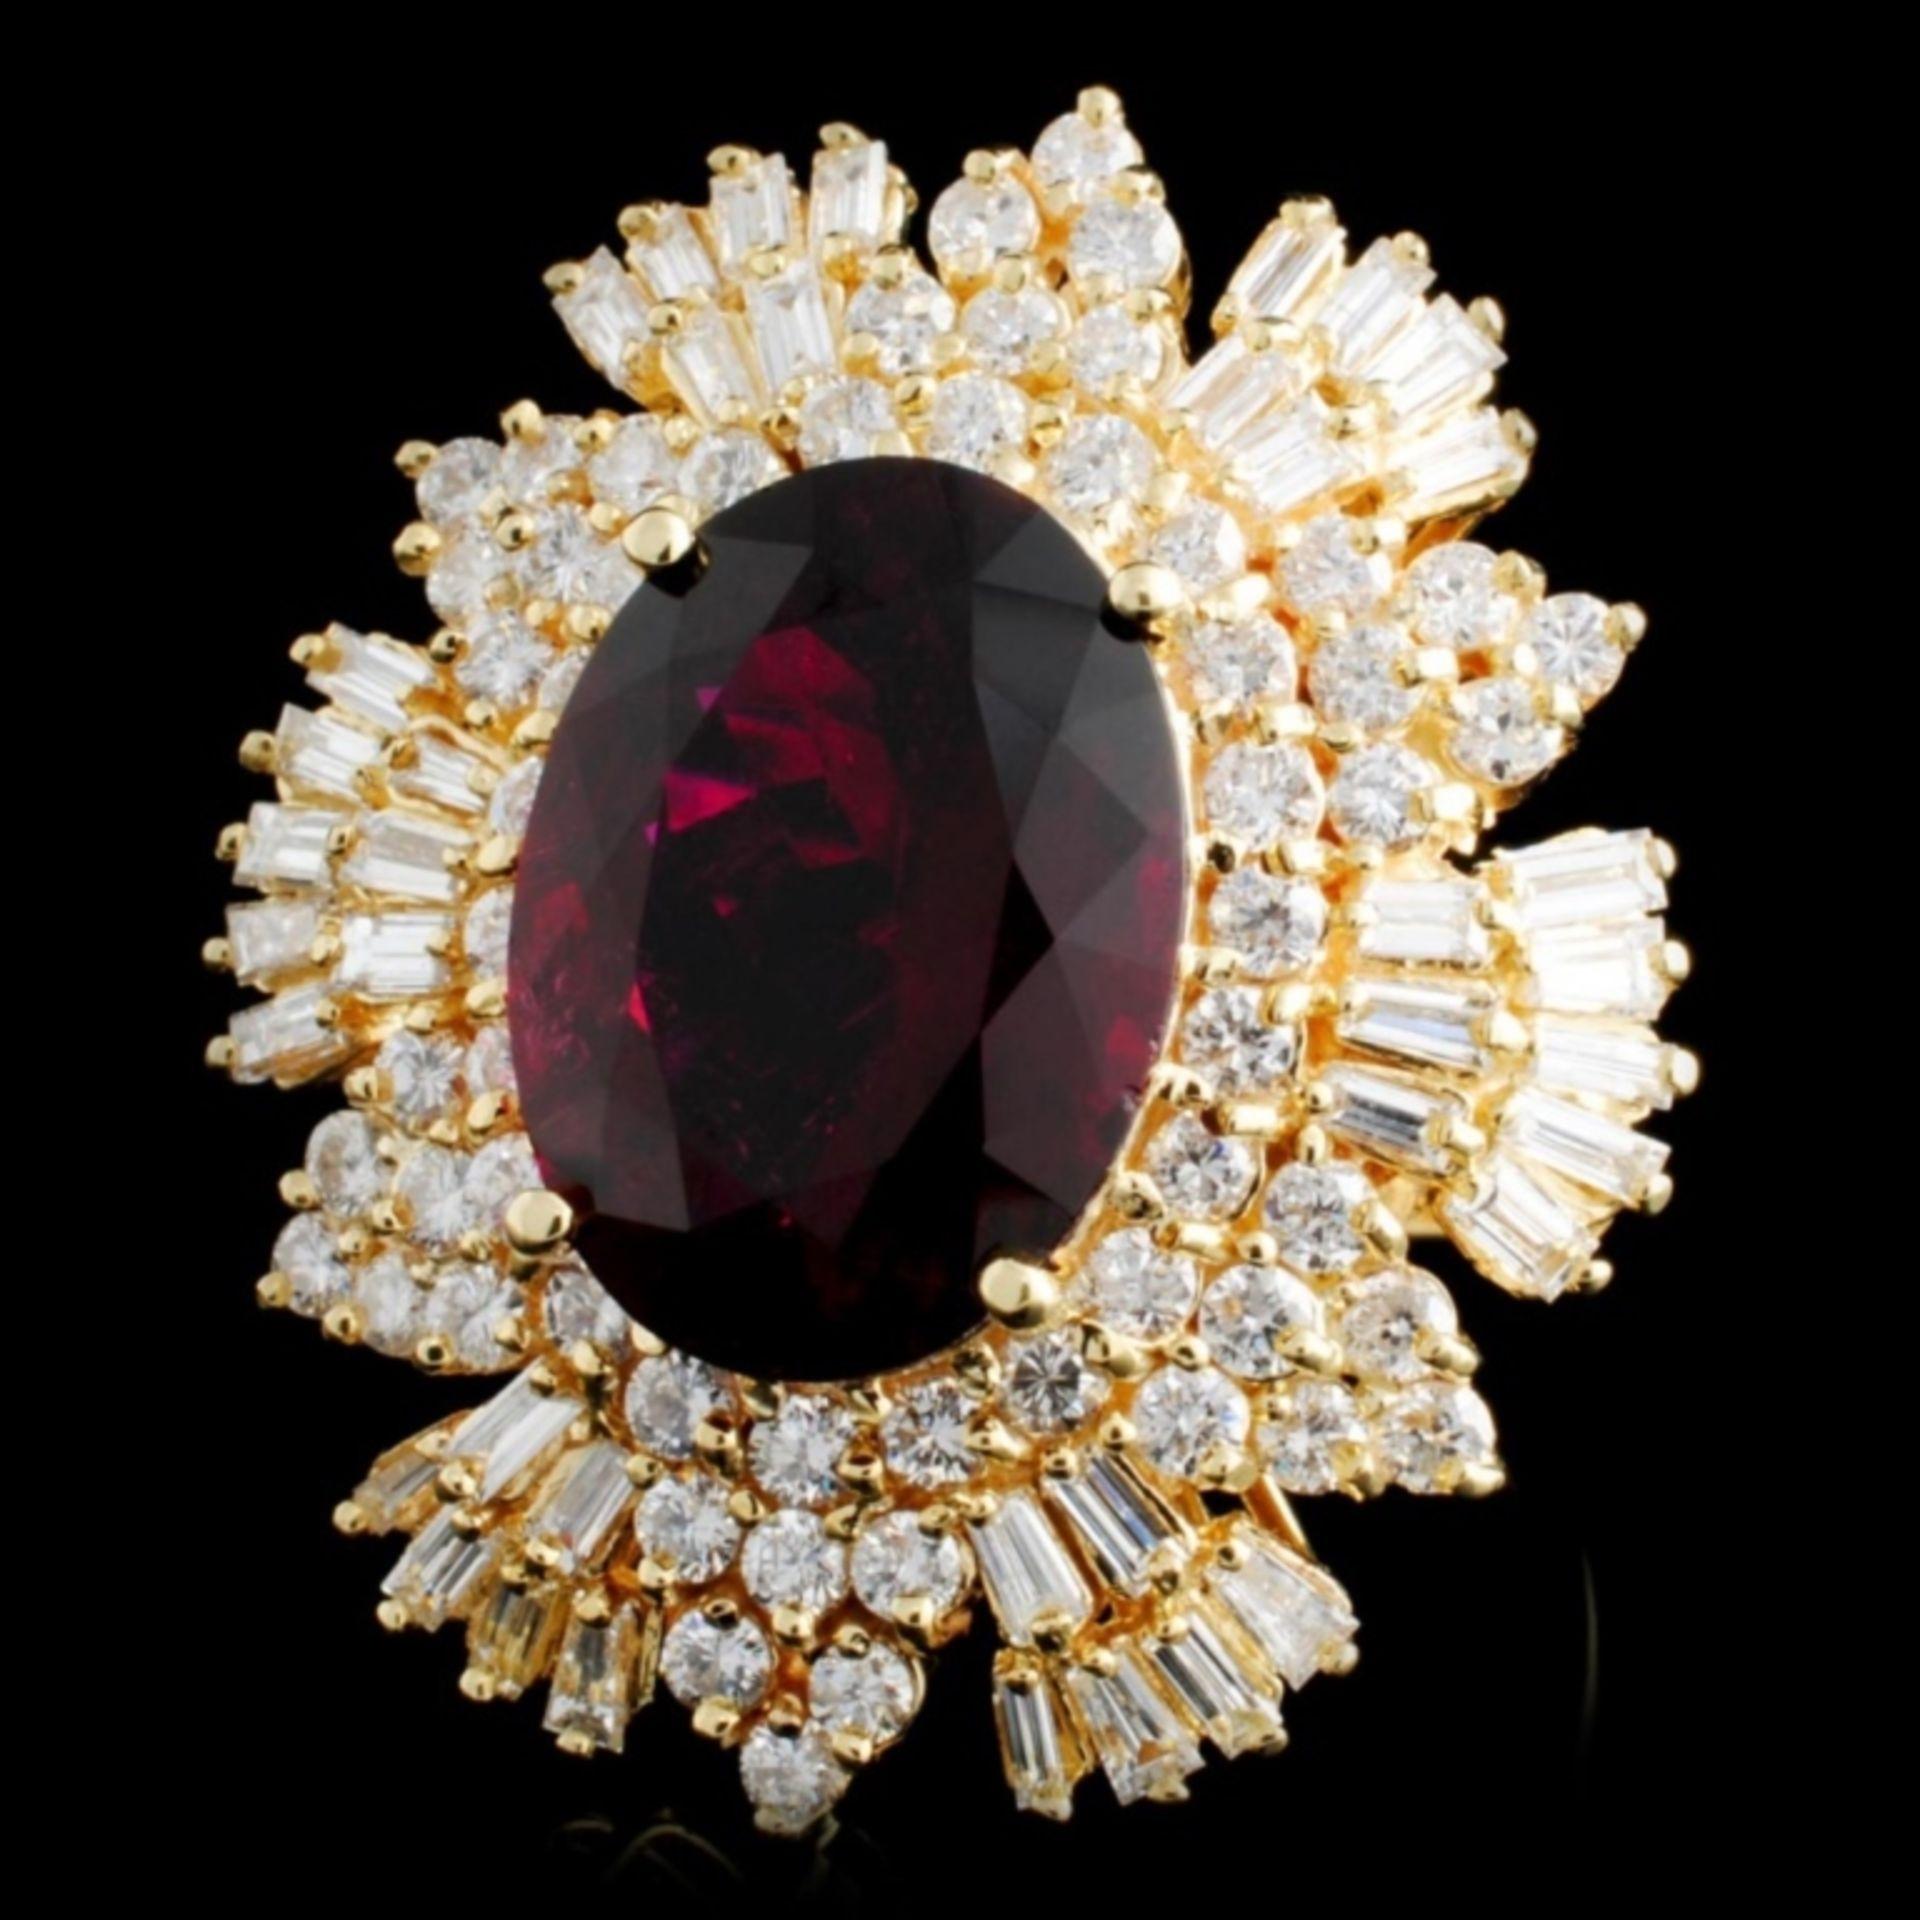 14K Gold 7.83ct Tourmaline & 2.55ctw Diamond Ring - Image 2 of 4